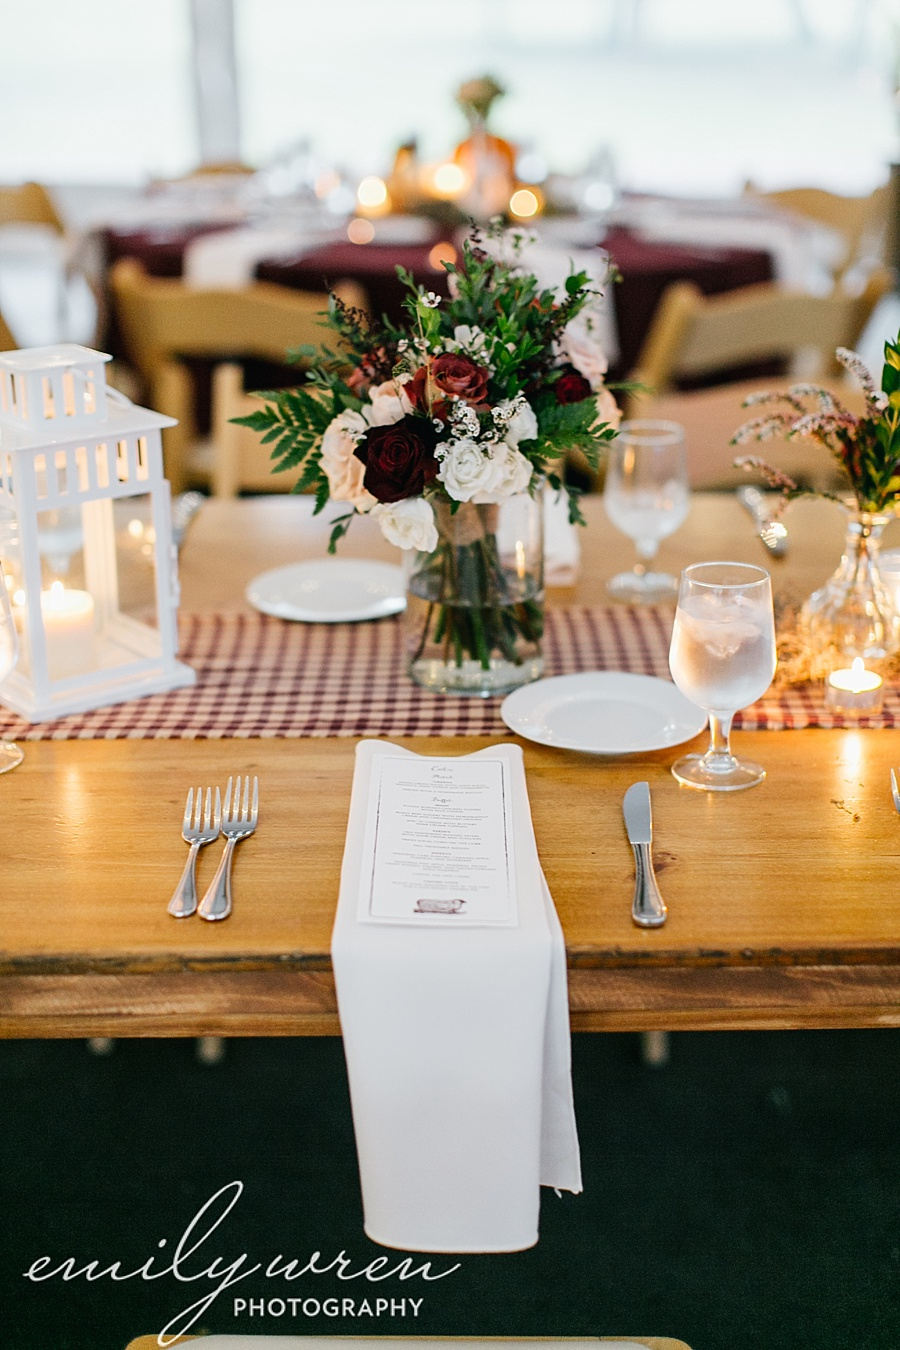 Emily_Wren_Photography_April_Lynn_Designs_Ash_Mill_Farm_Jill_John_October_Rustic_Wedding_Flannel_Farm_Sheep_Holicong_New_Hope184